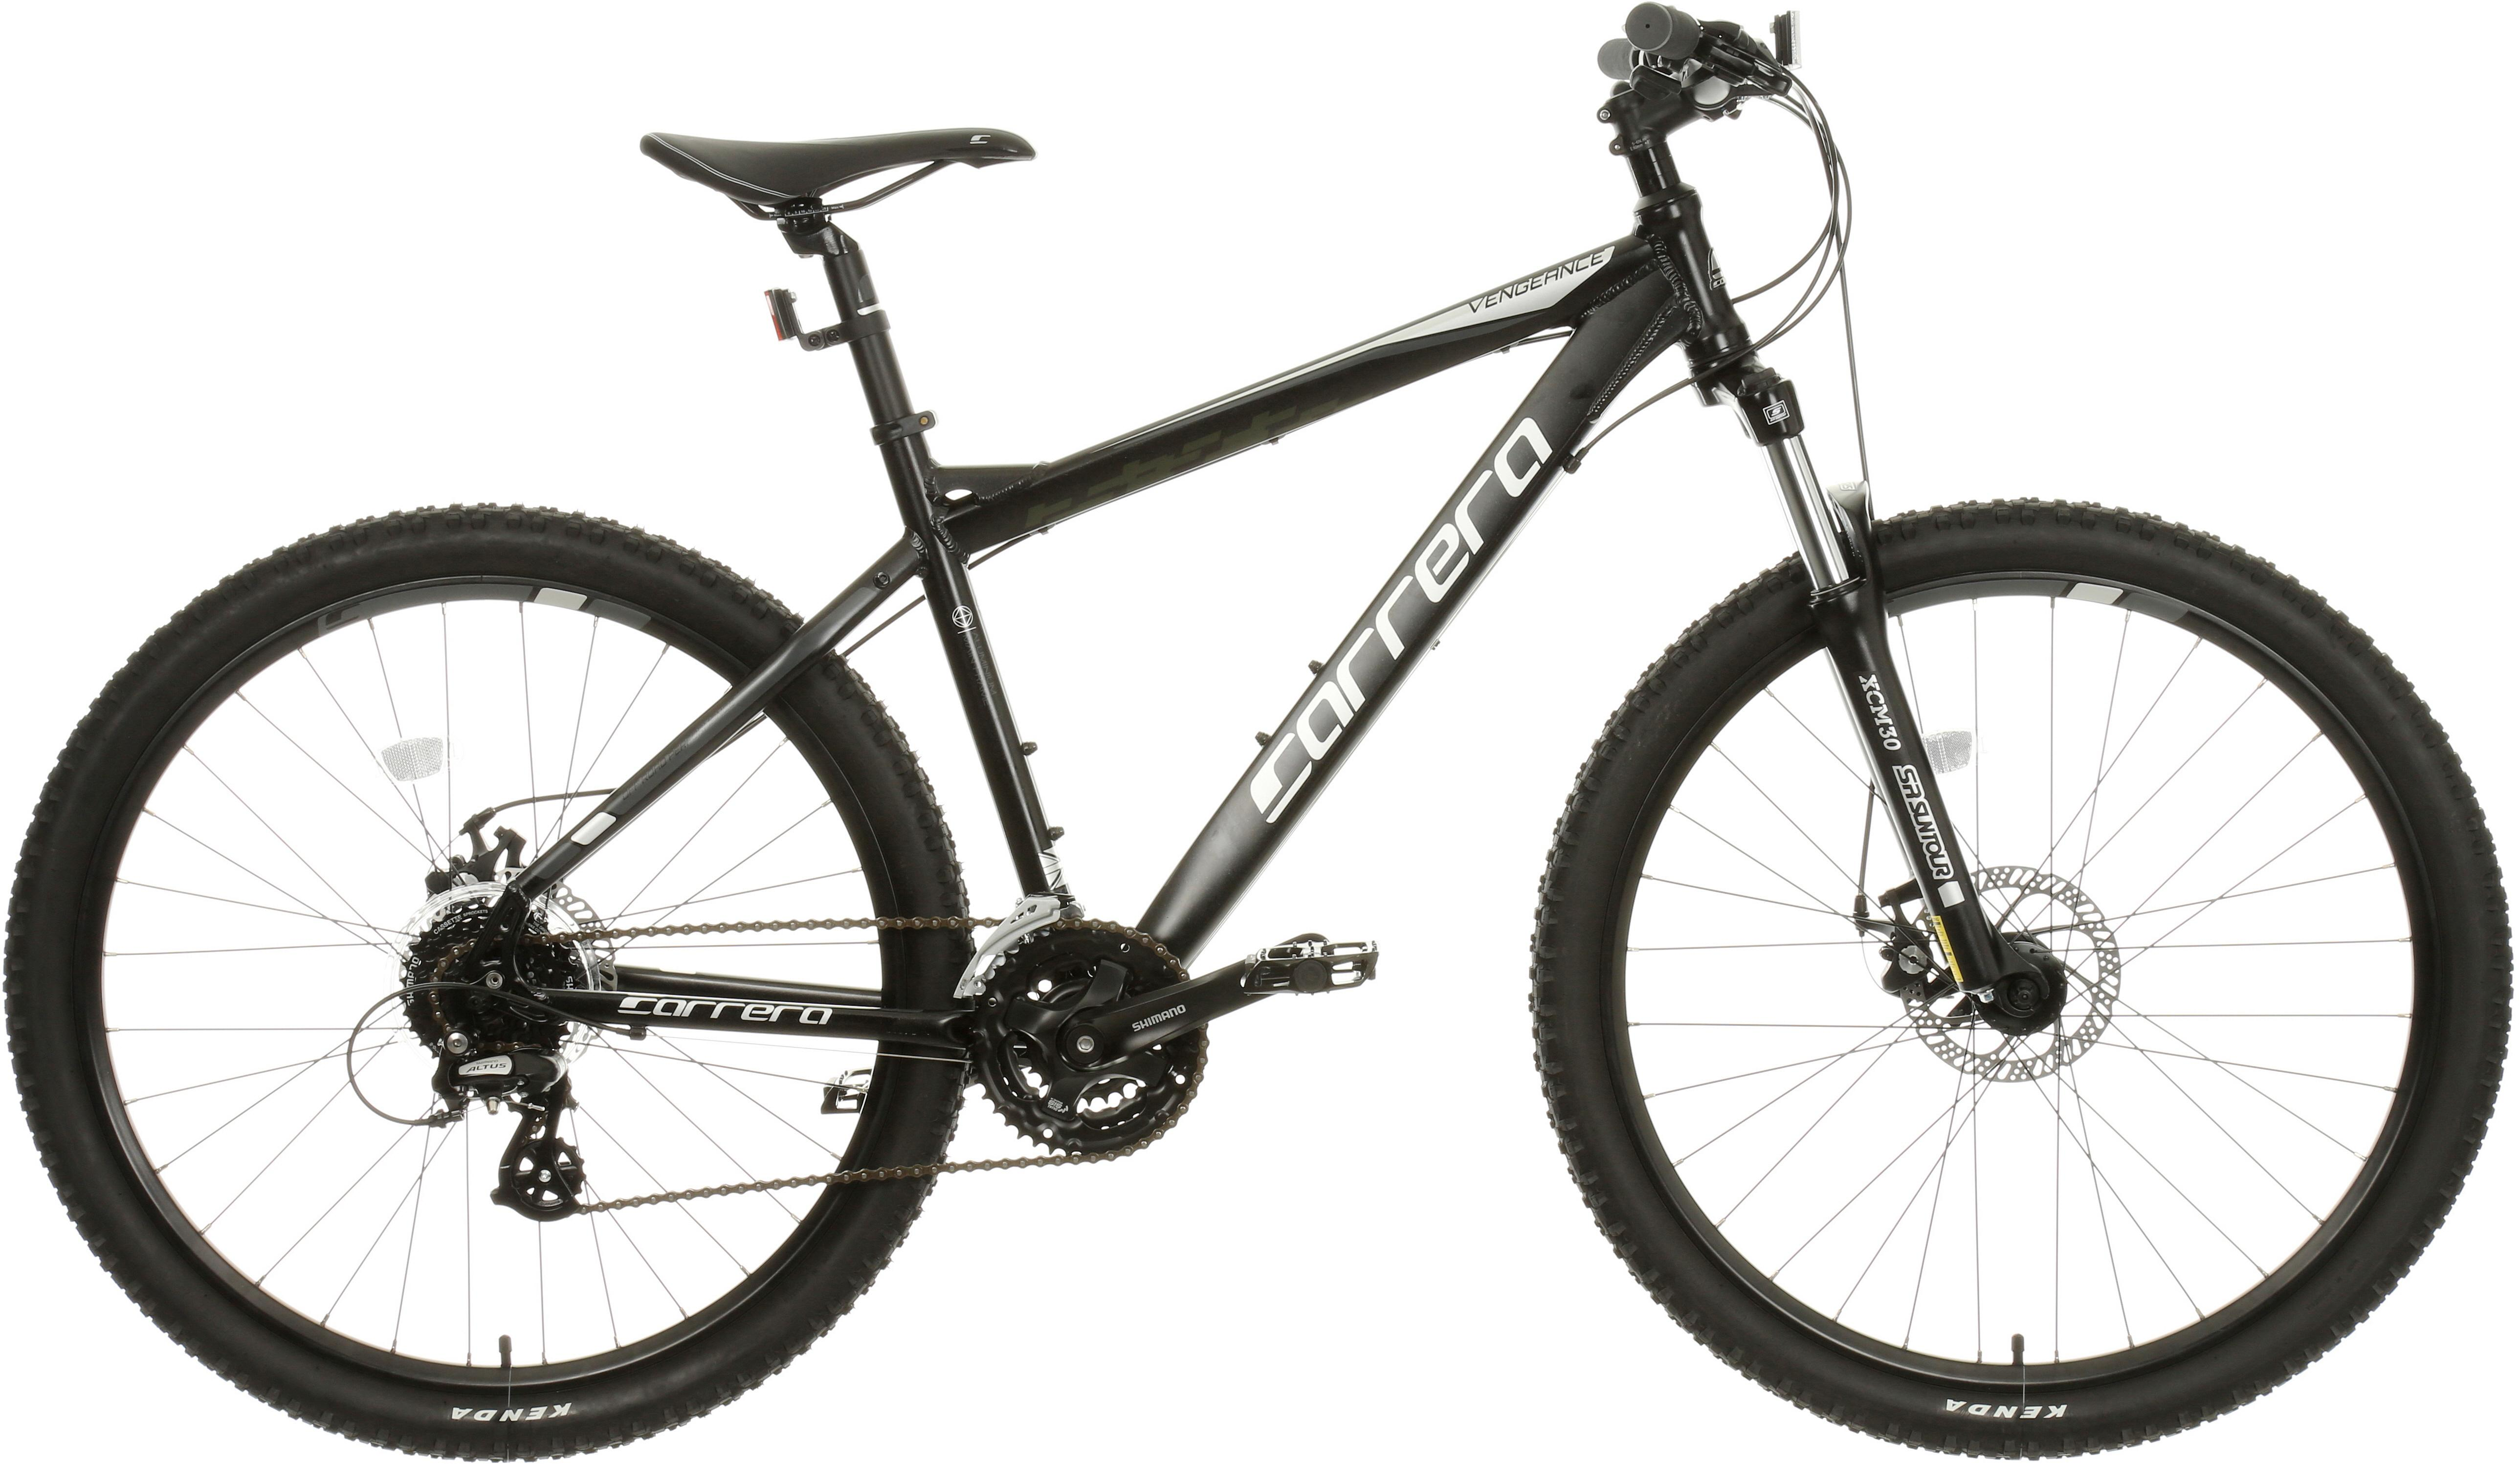 Carrera Vengeance Mens Mountain Bike - Black, XL